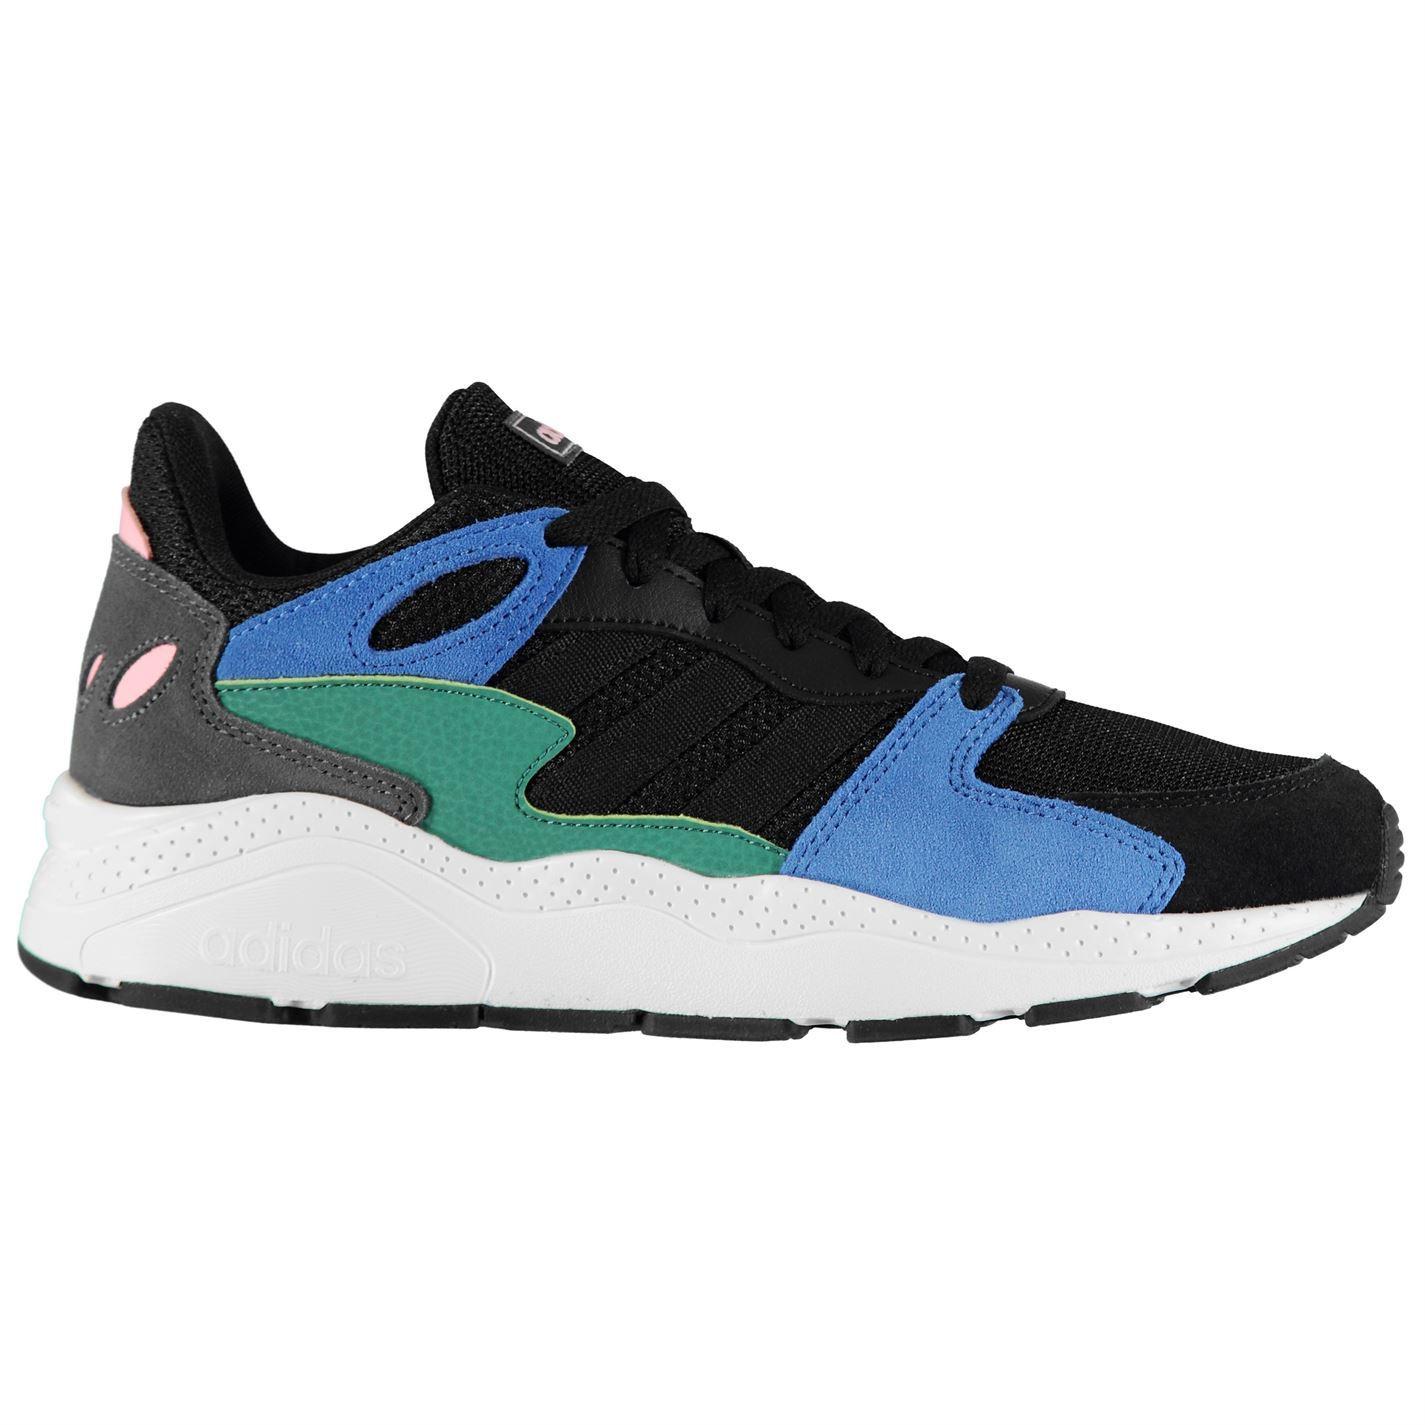 Adidas-Crazychaos-Baskets-Homme-Chaussures-De-Loisirs-Chaussures-Baskets miniature 13